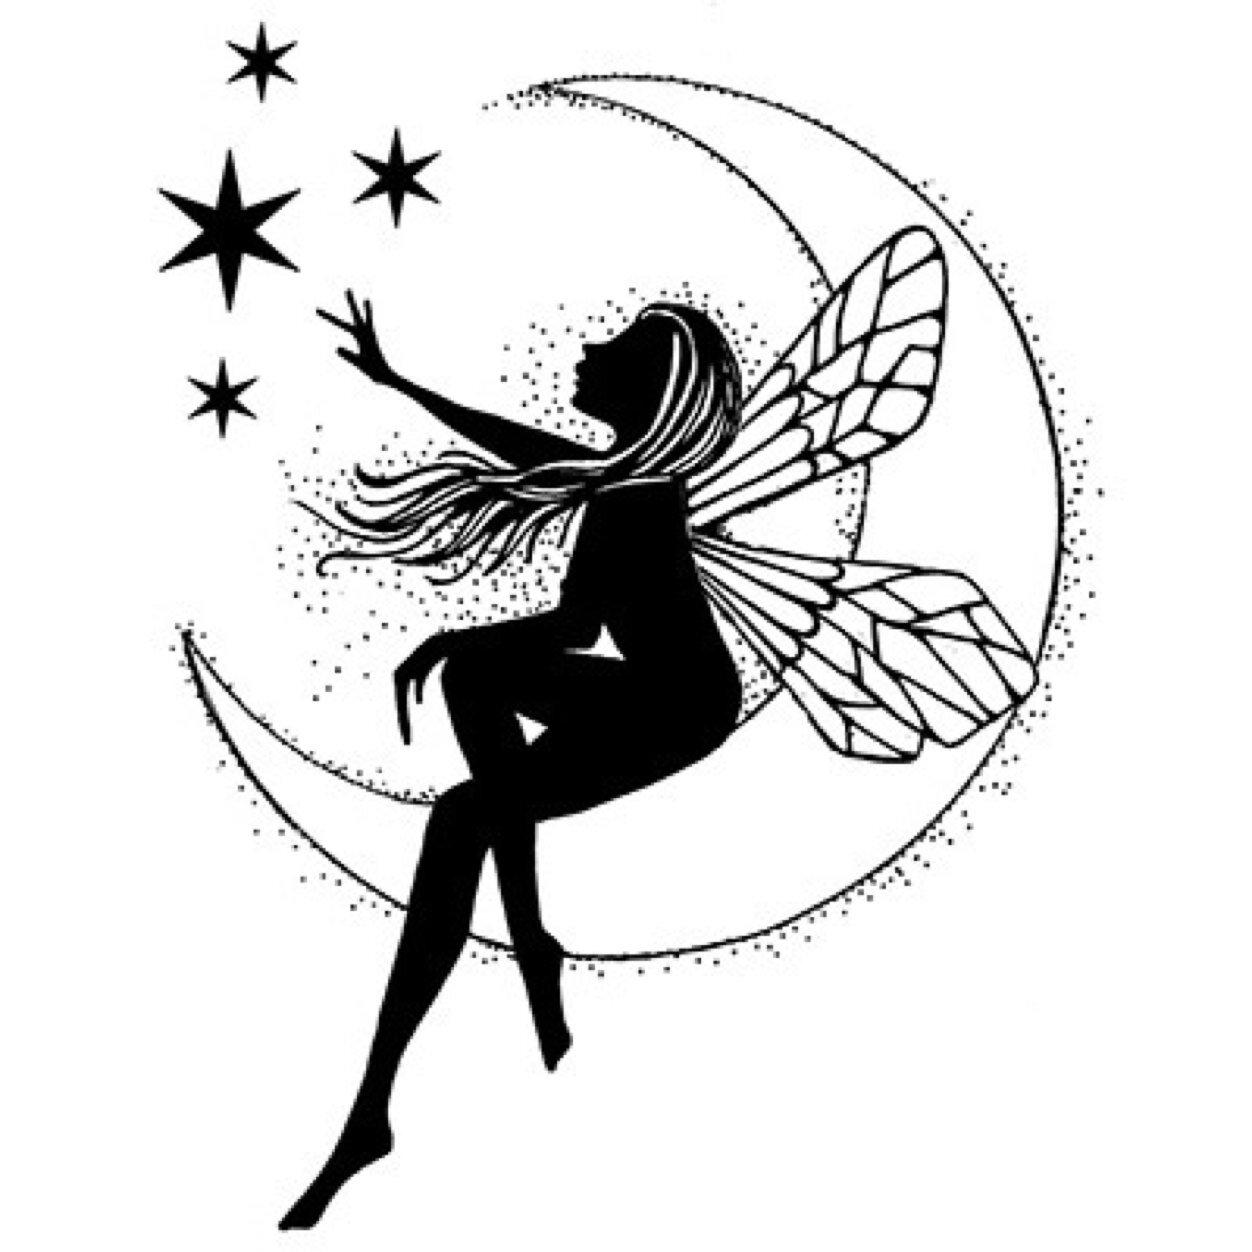 1252x1252 Fairy With Stars Tattoos Ideas